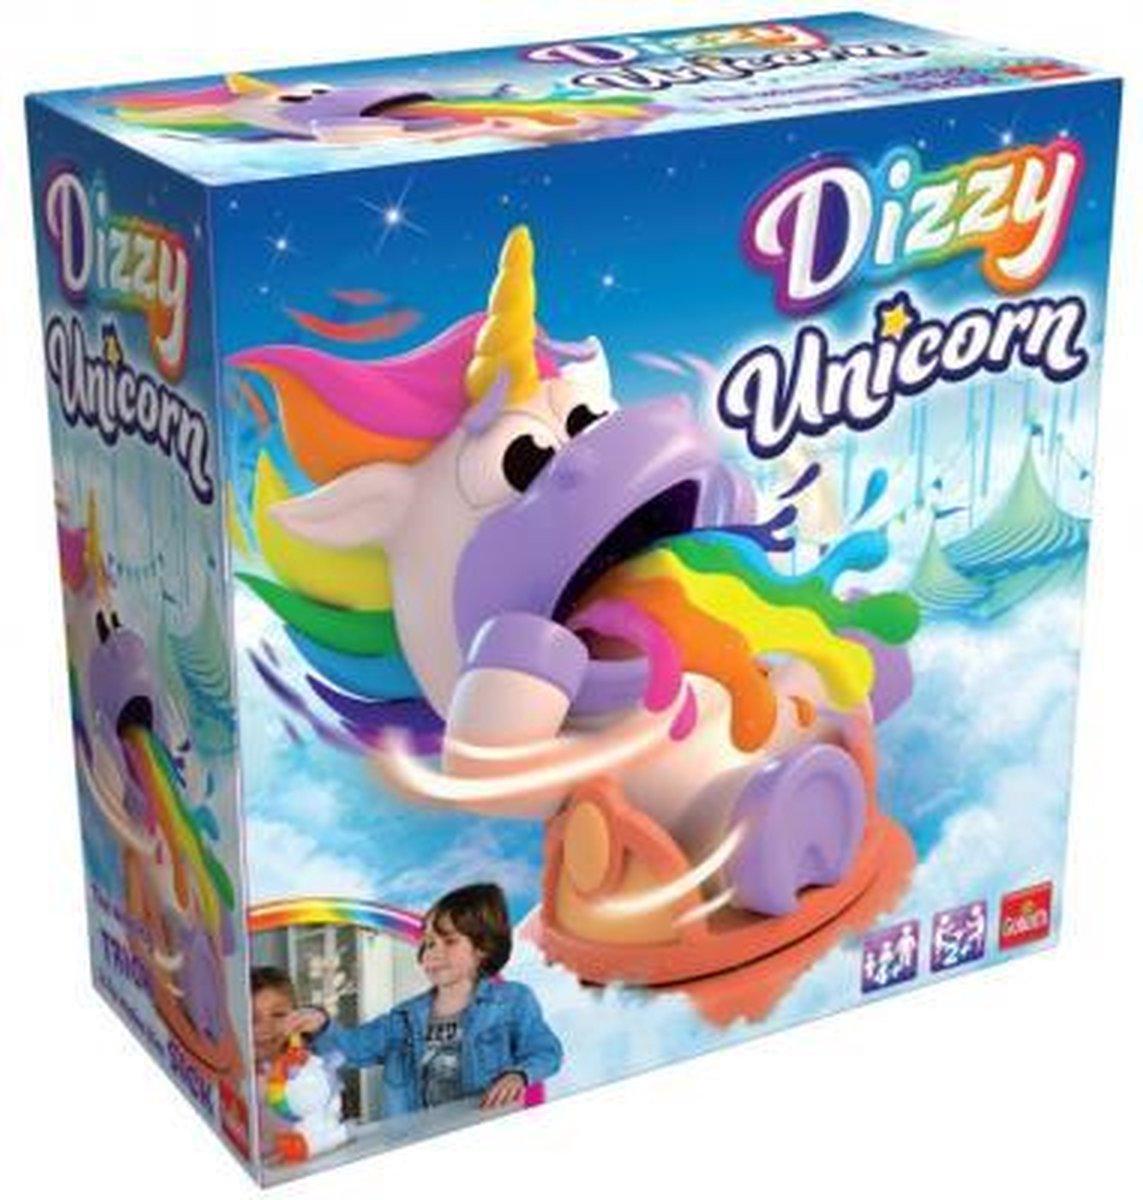 Dizzy Unicorn - Duizel Eenhoorn